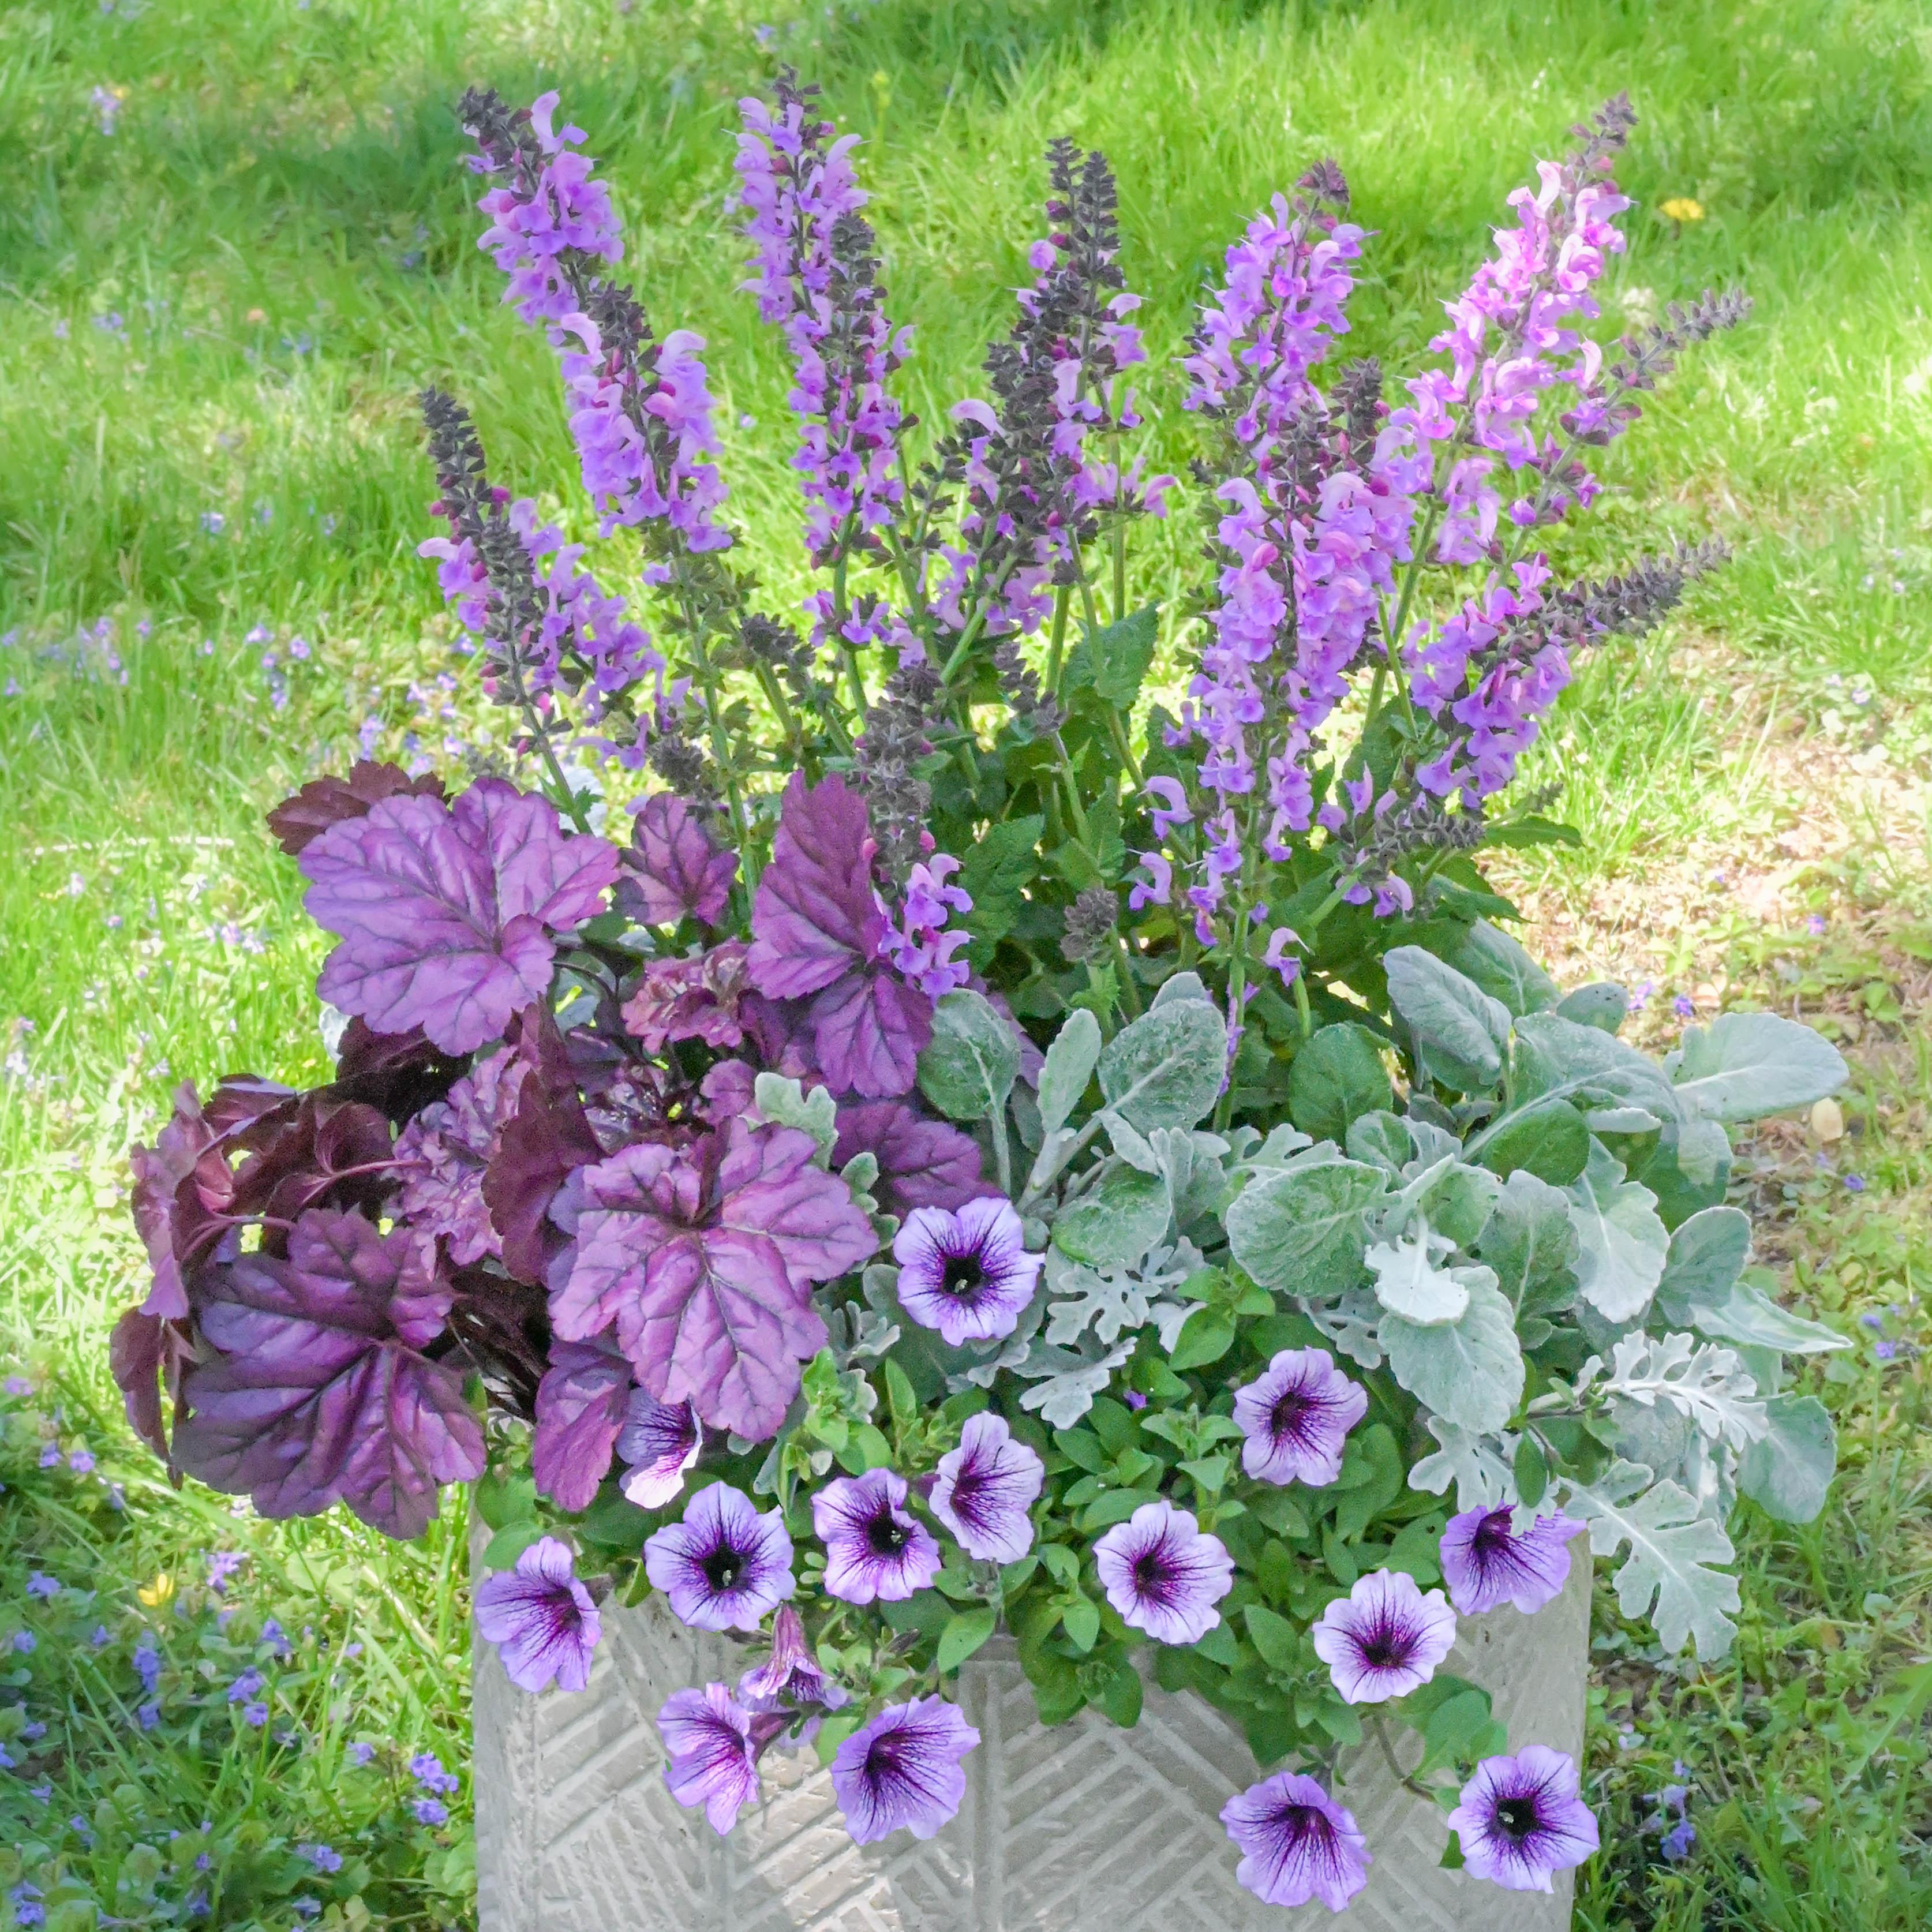 Sun Container - Calibrachoa, Lamb's Ear, Salvia and Heuchera